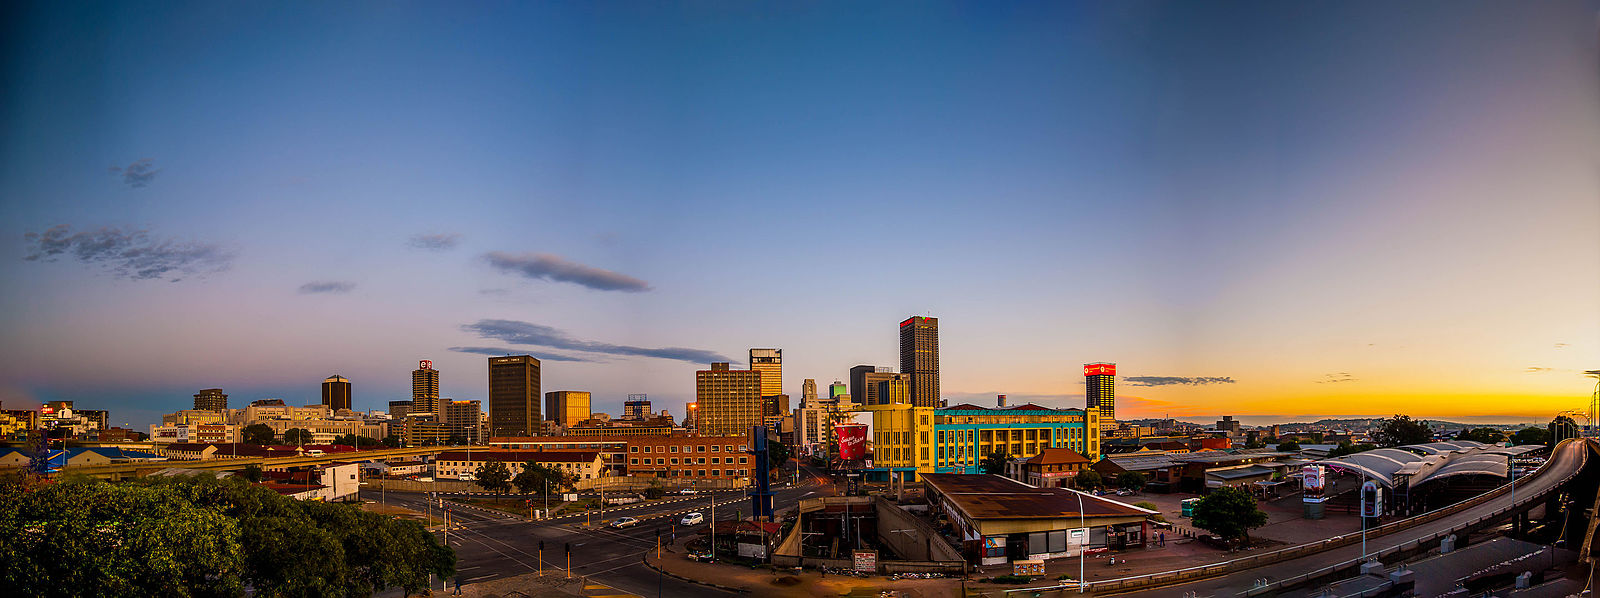 Johannesburg_From_M2_Highway_Looking_North.jpg